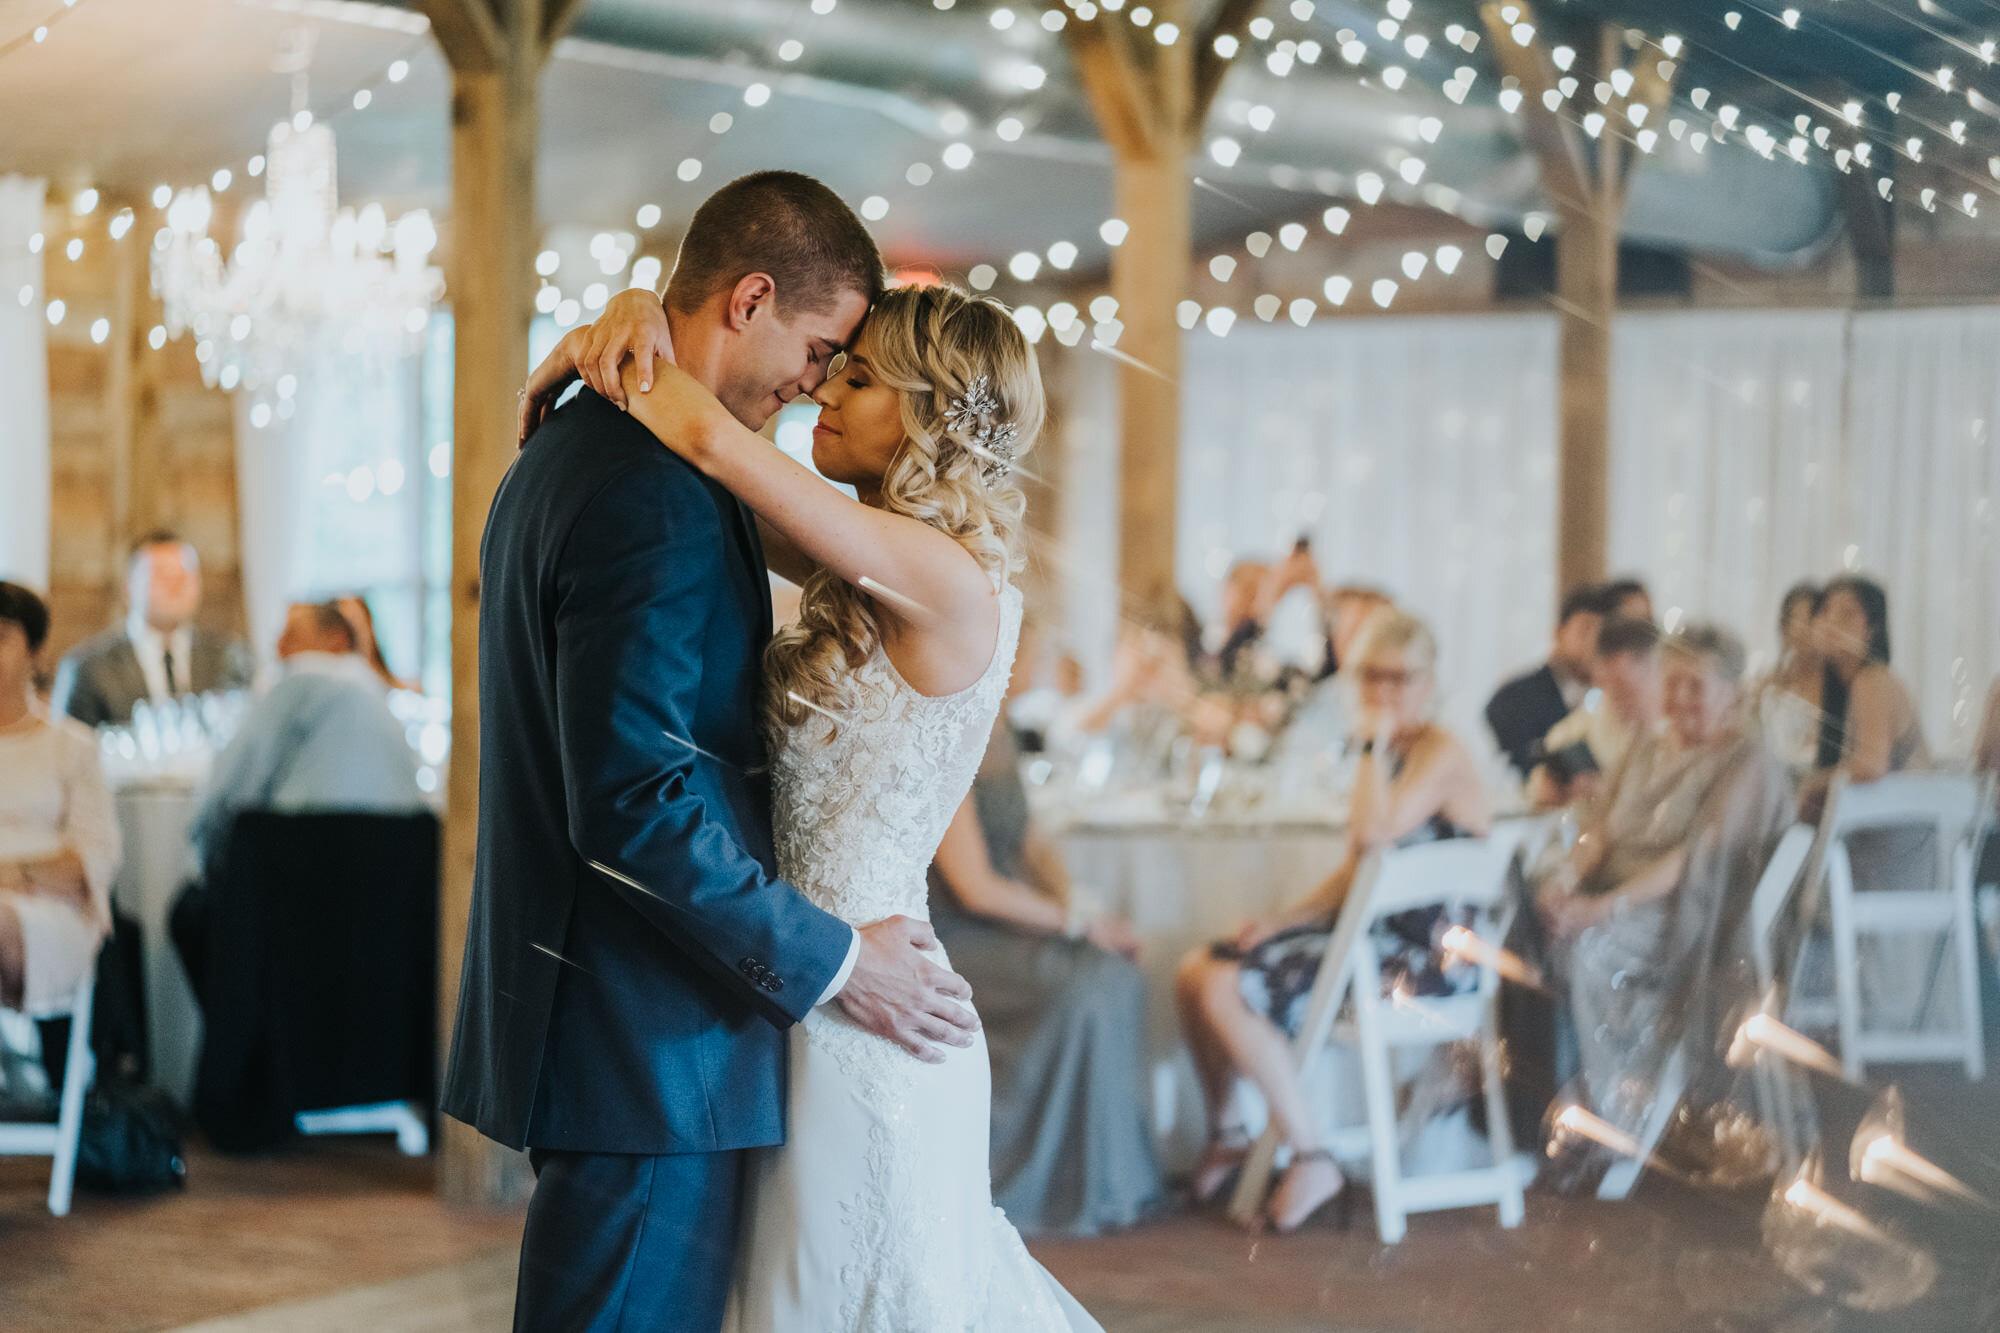 438Sean_Emily_Wedding_3-30-19.jpg